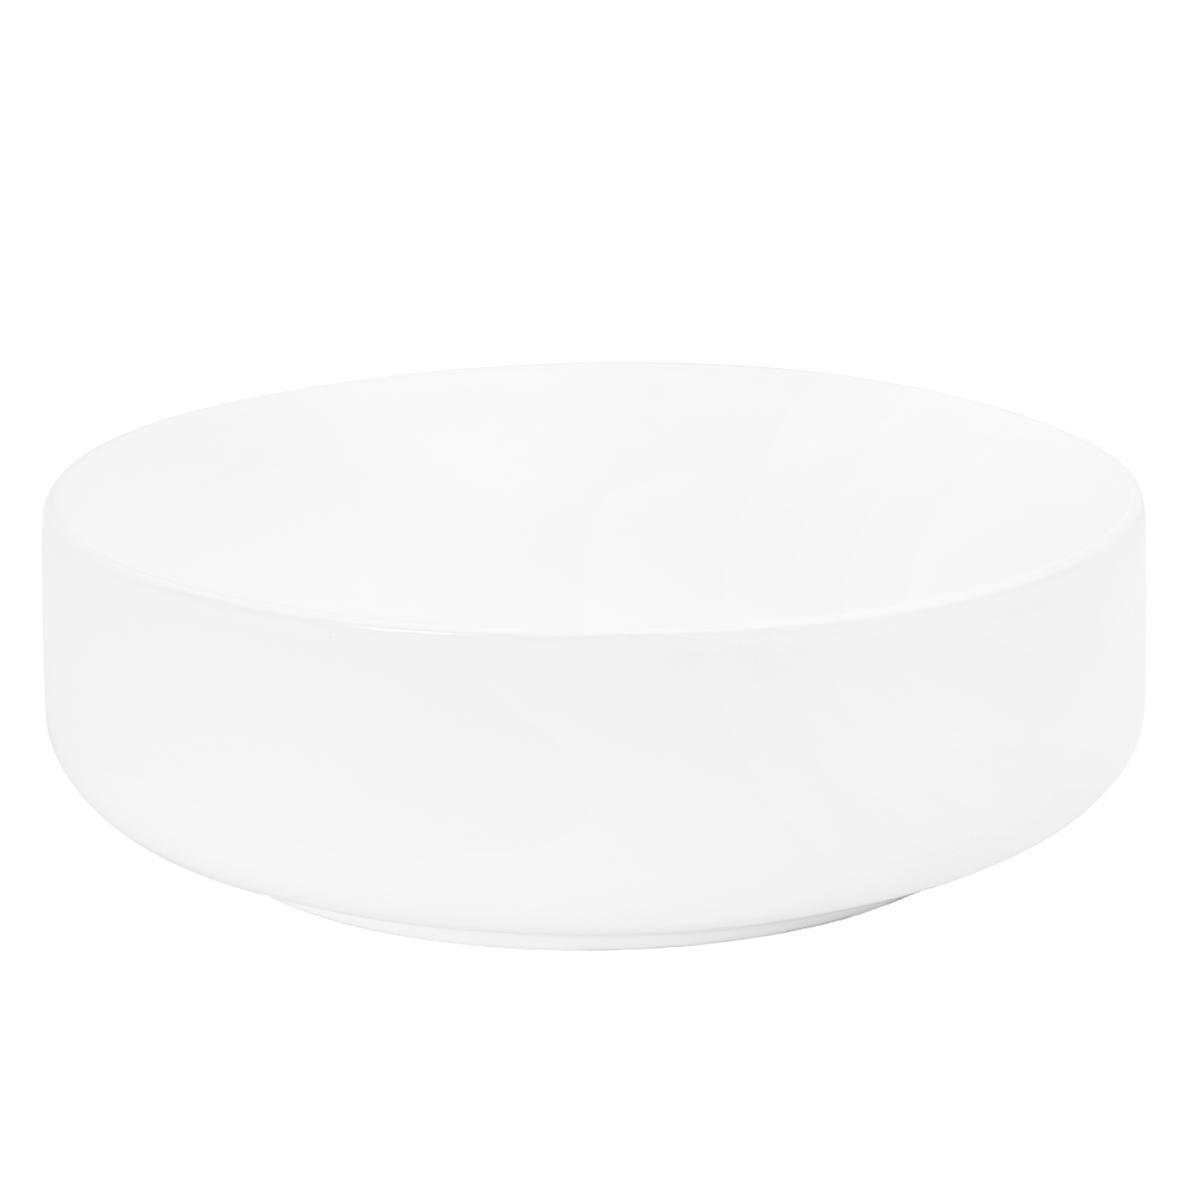 Bowl Lutxi Redondo Blanco Mate - 41.5X41.5X13.5 cm